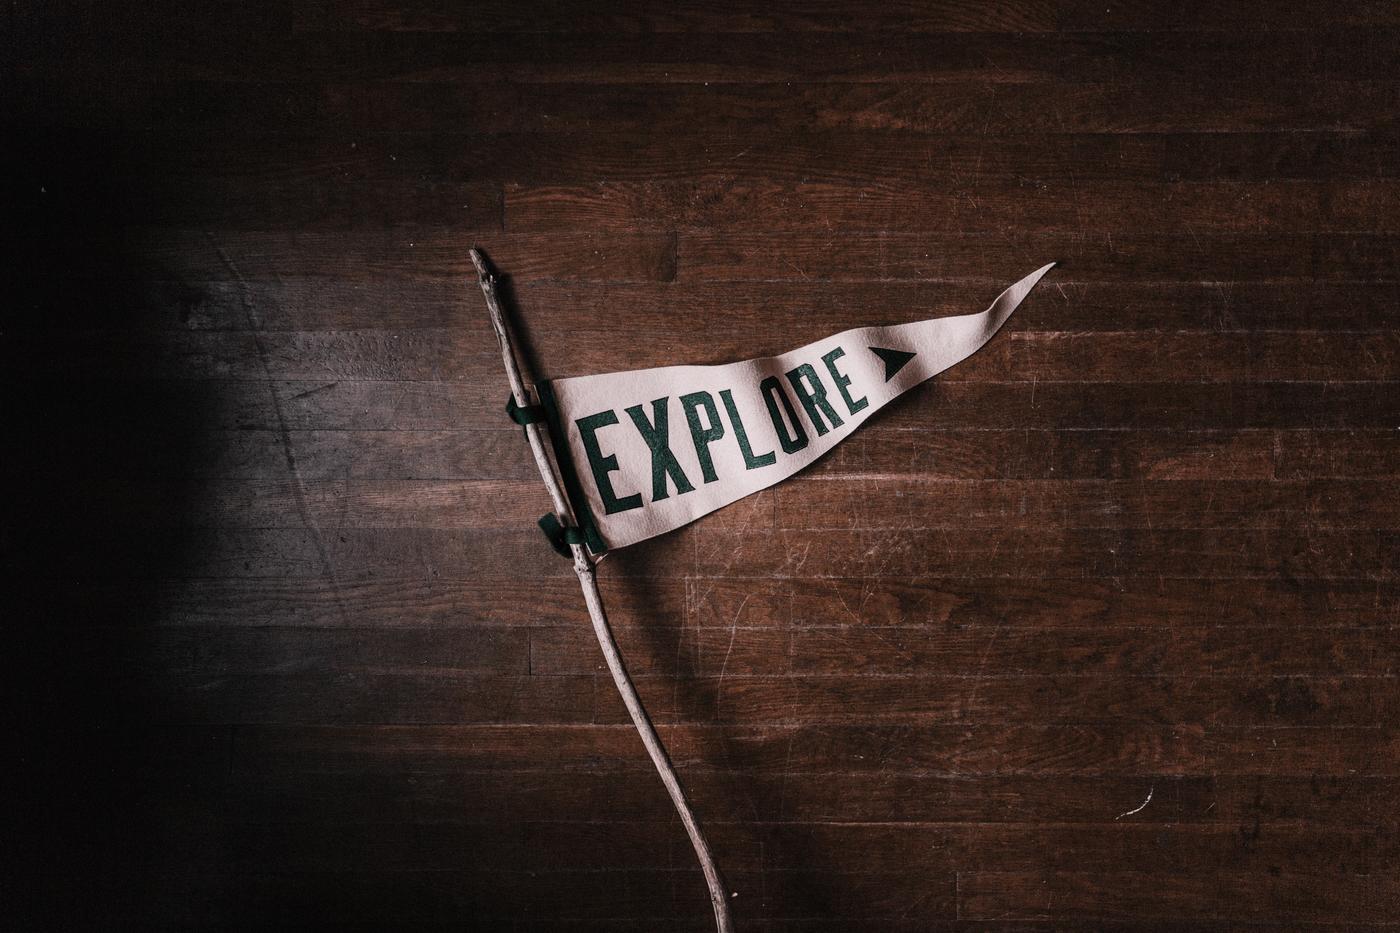 Explore Flag Sign